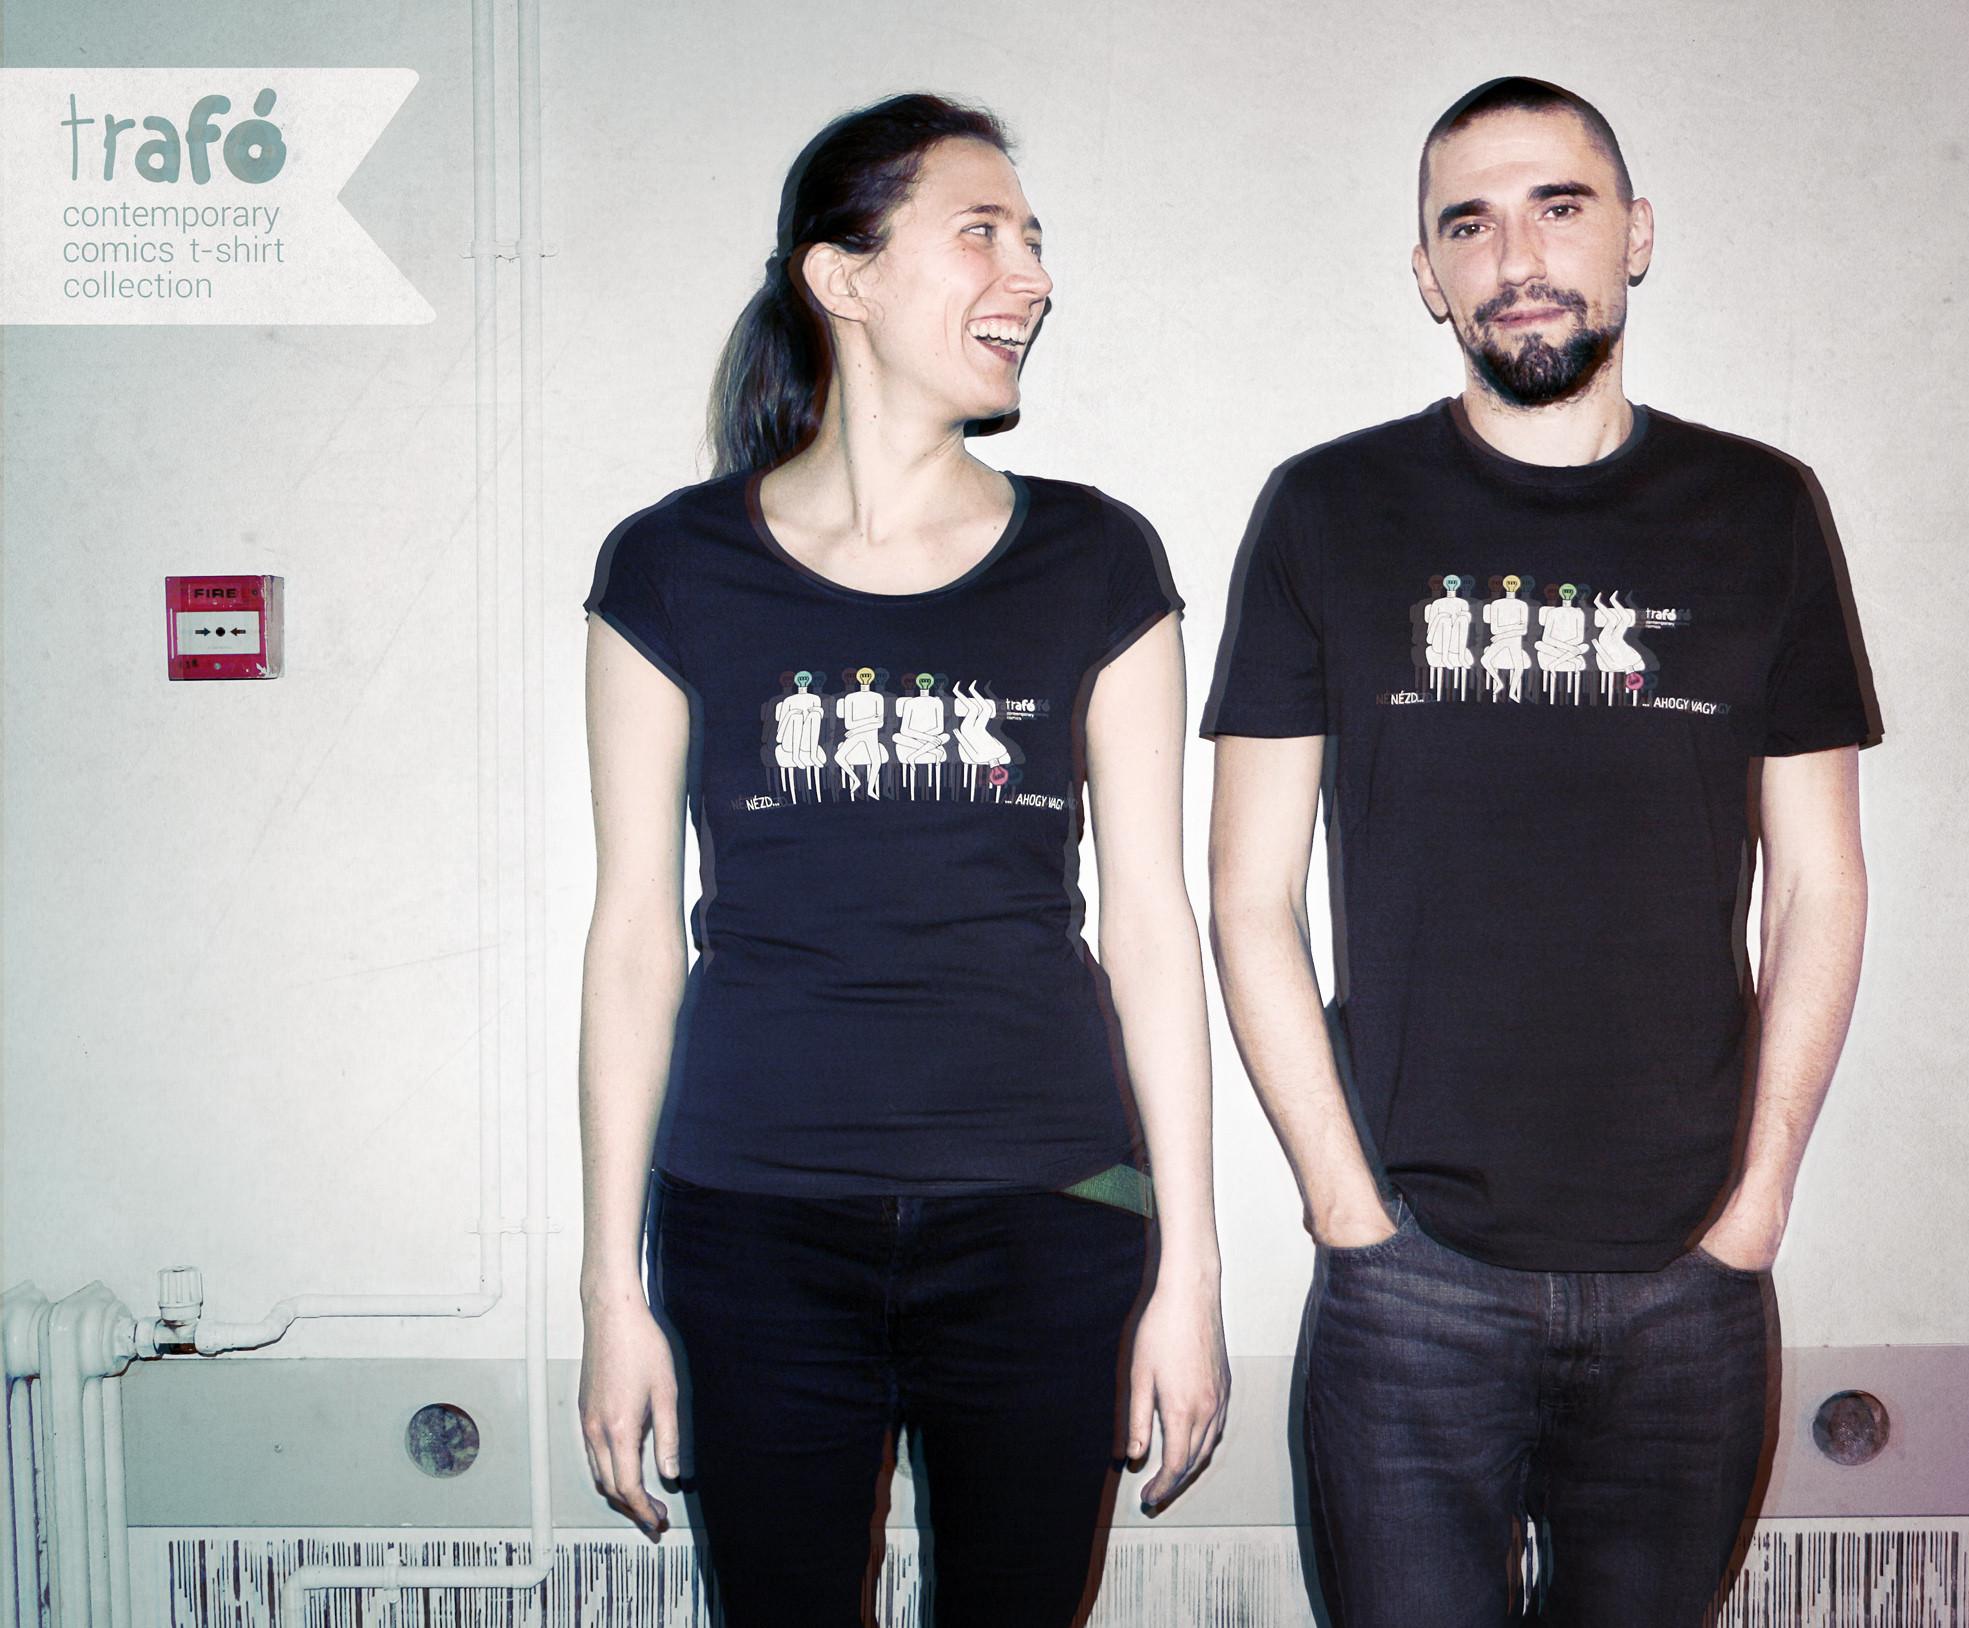 Trafo_t-shirt_post